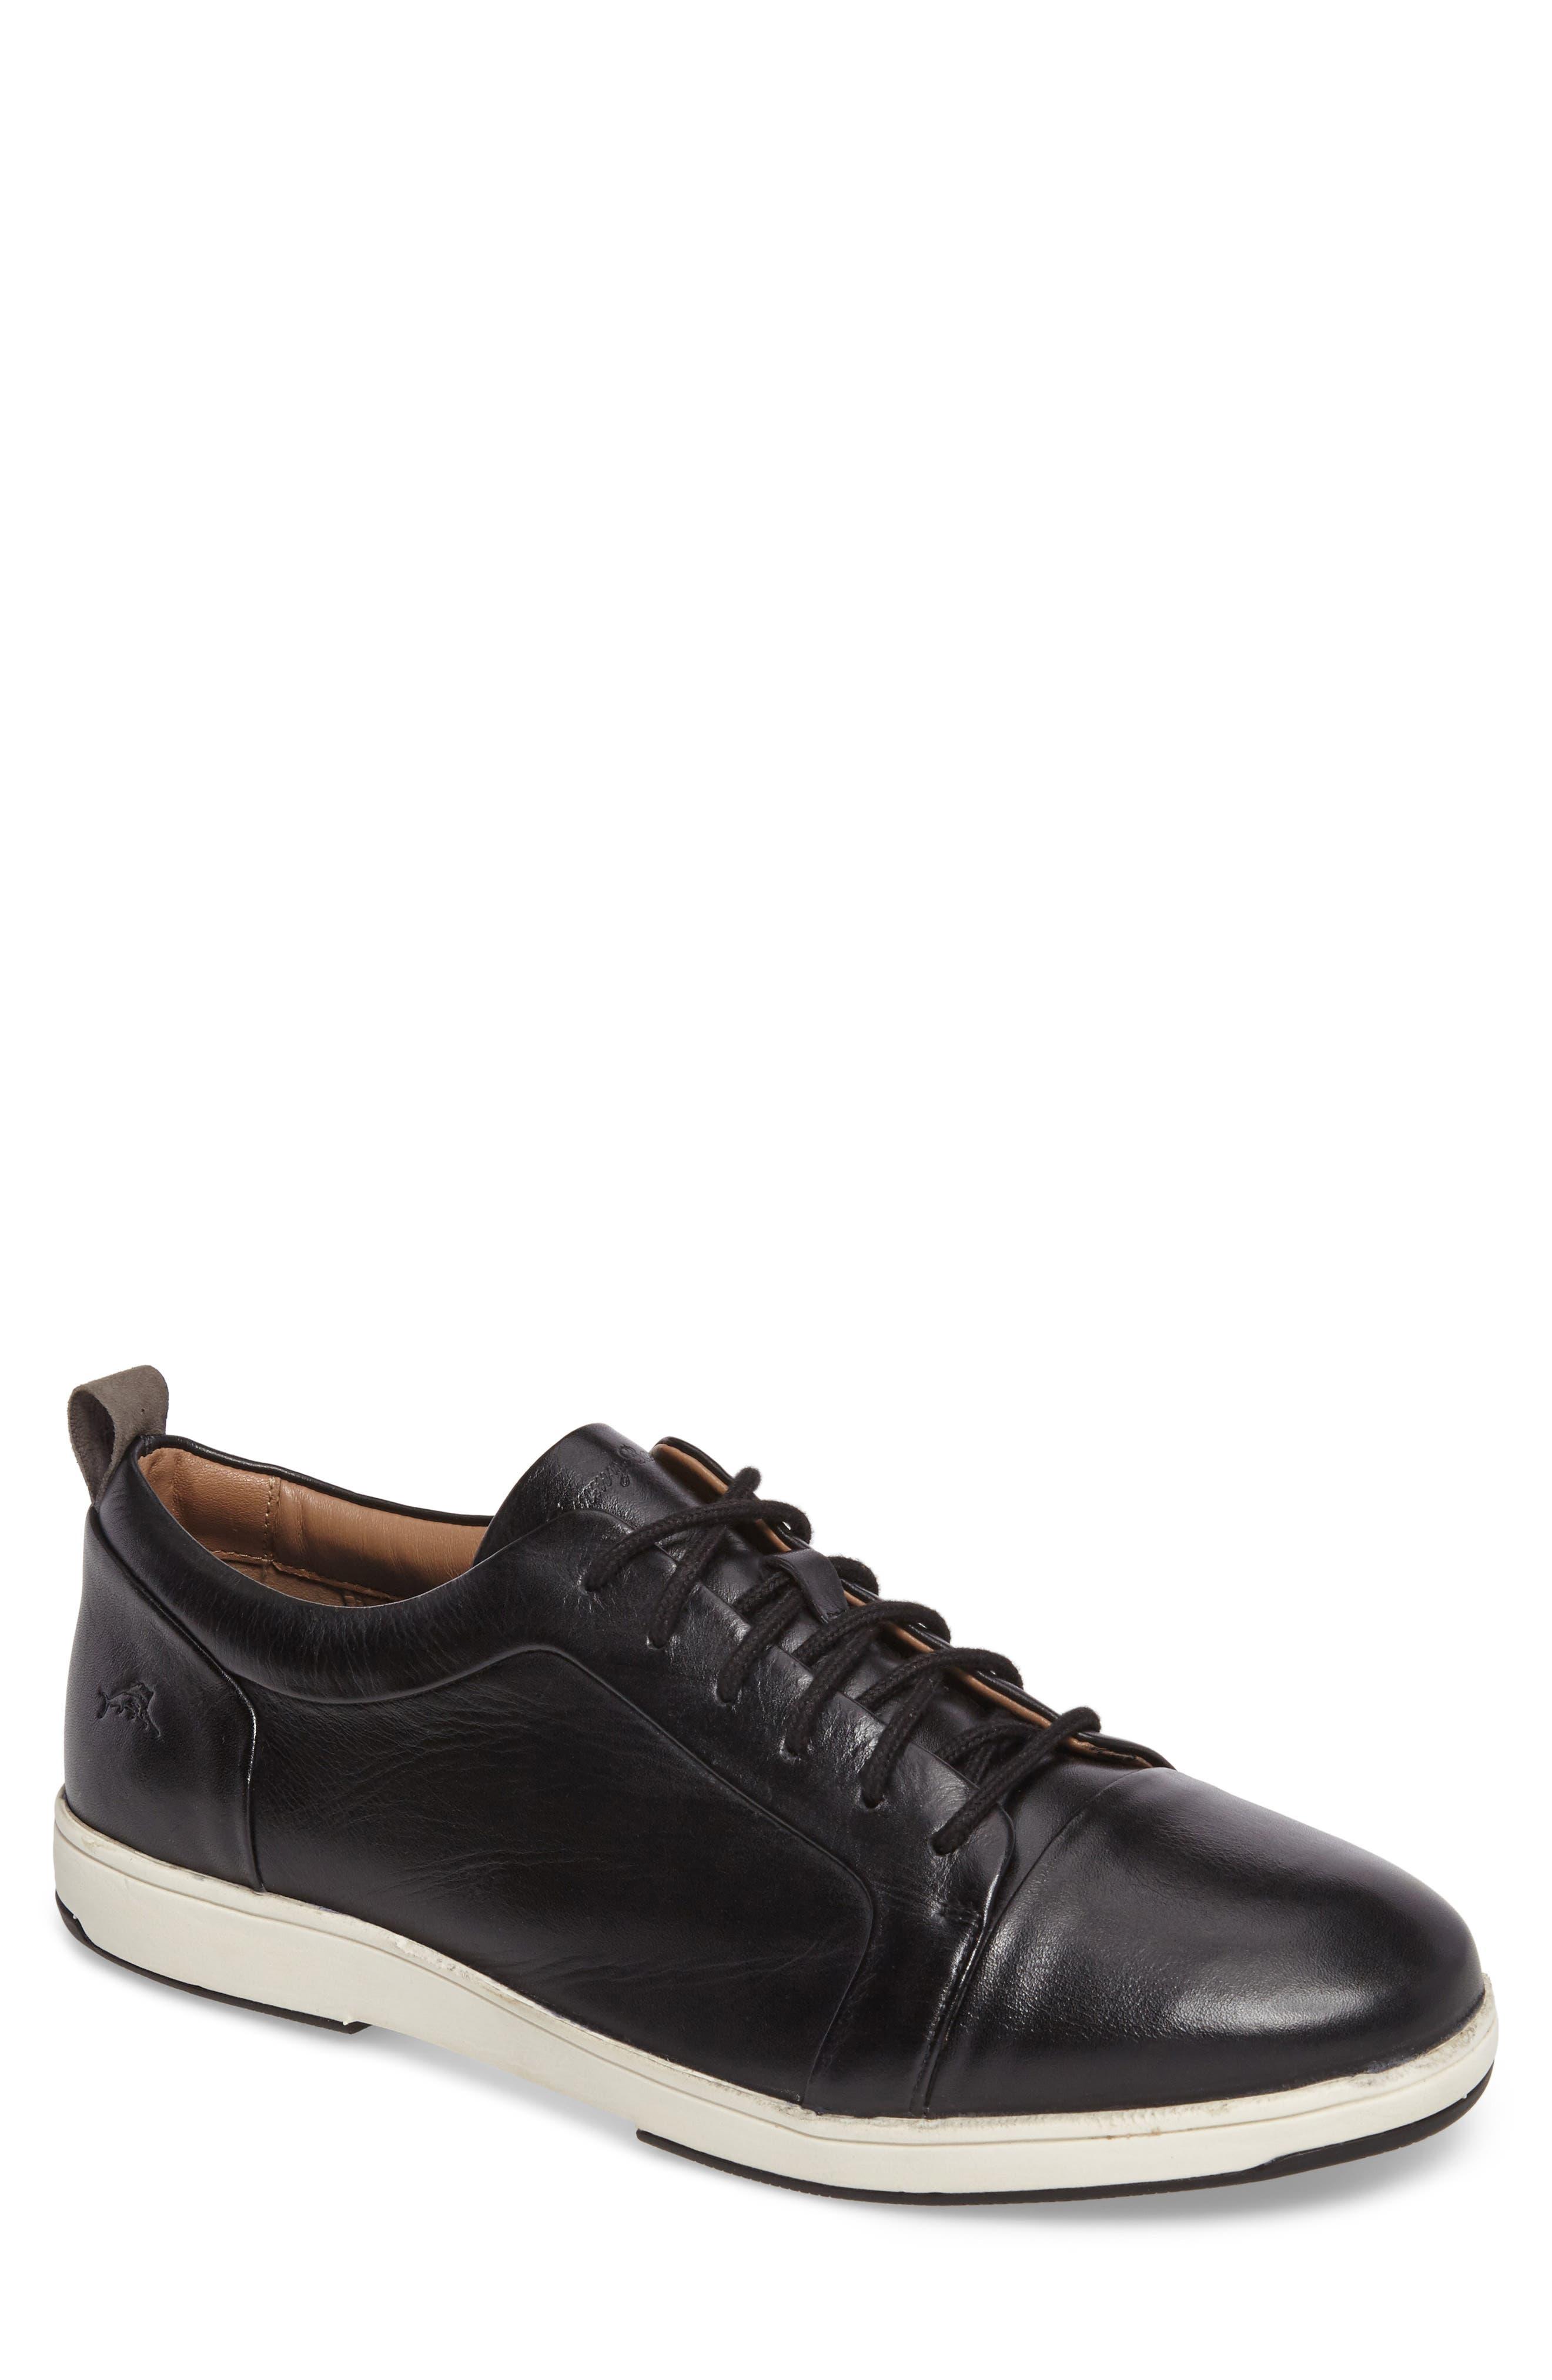 Cadiz Sneaker,                         Main,                         color, 001